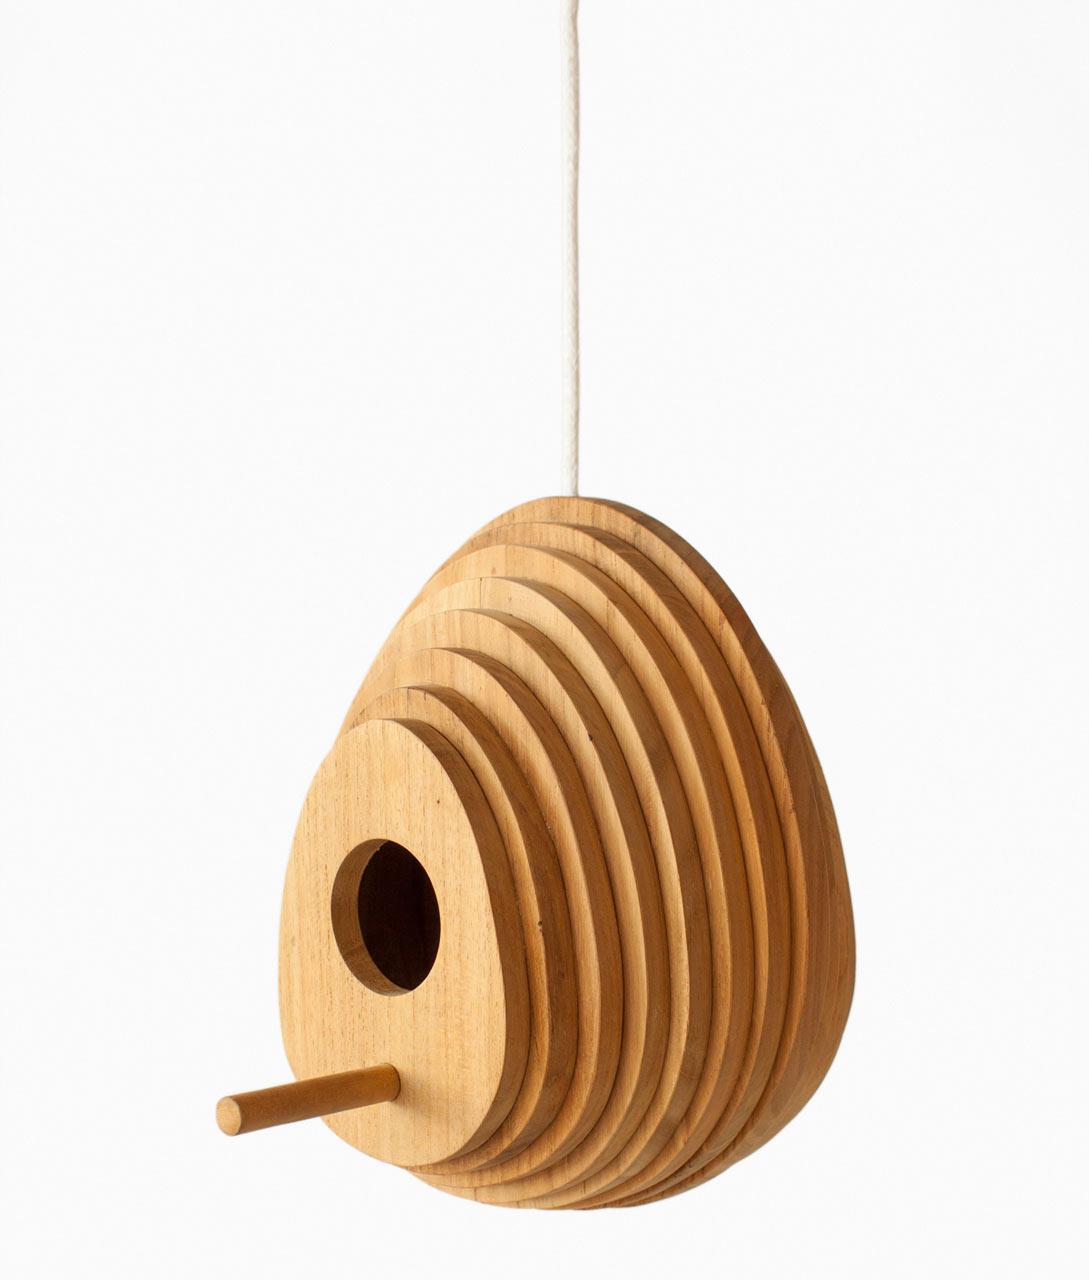 Tree Ring Birdhouse by Jarrod Lim for Hinika